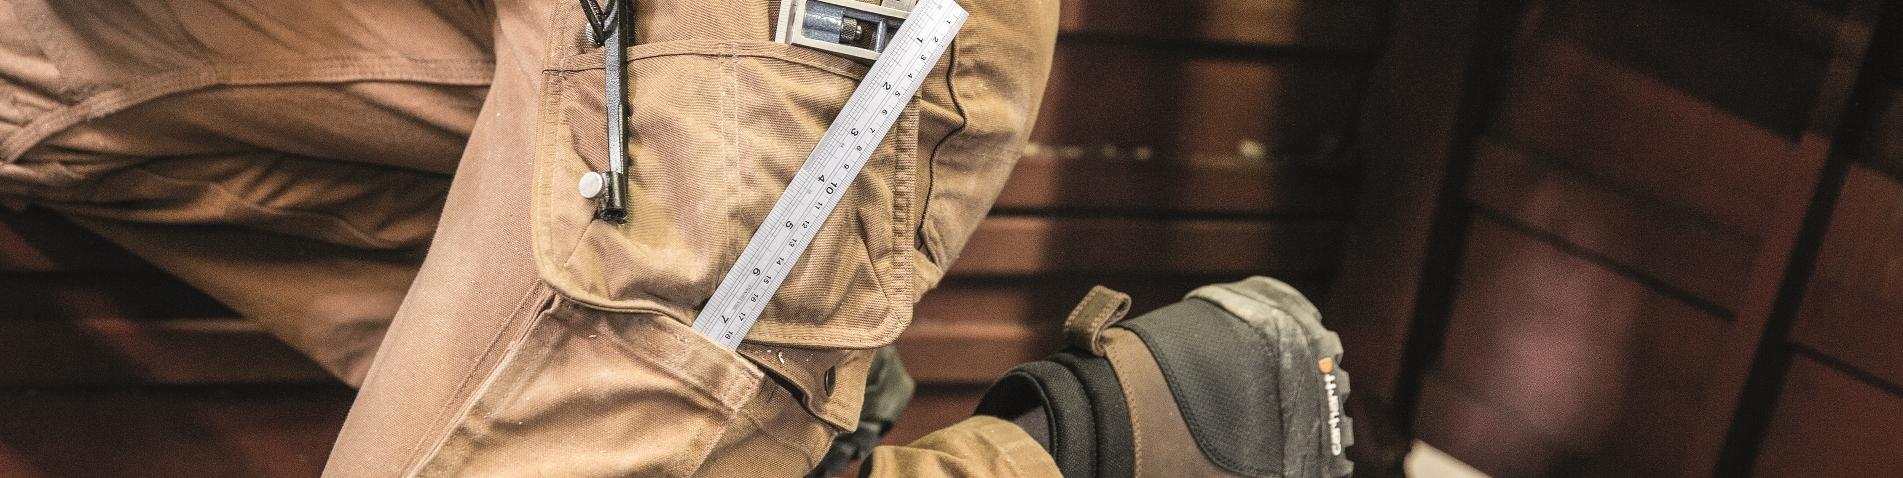 workwear4all-be -  Bouw broeken banner breed